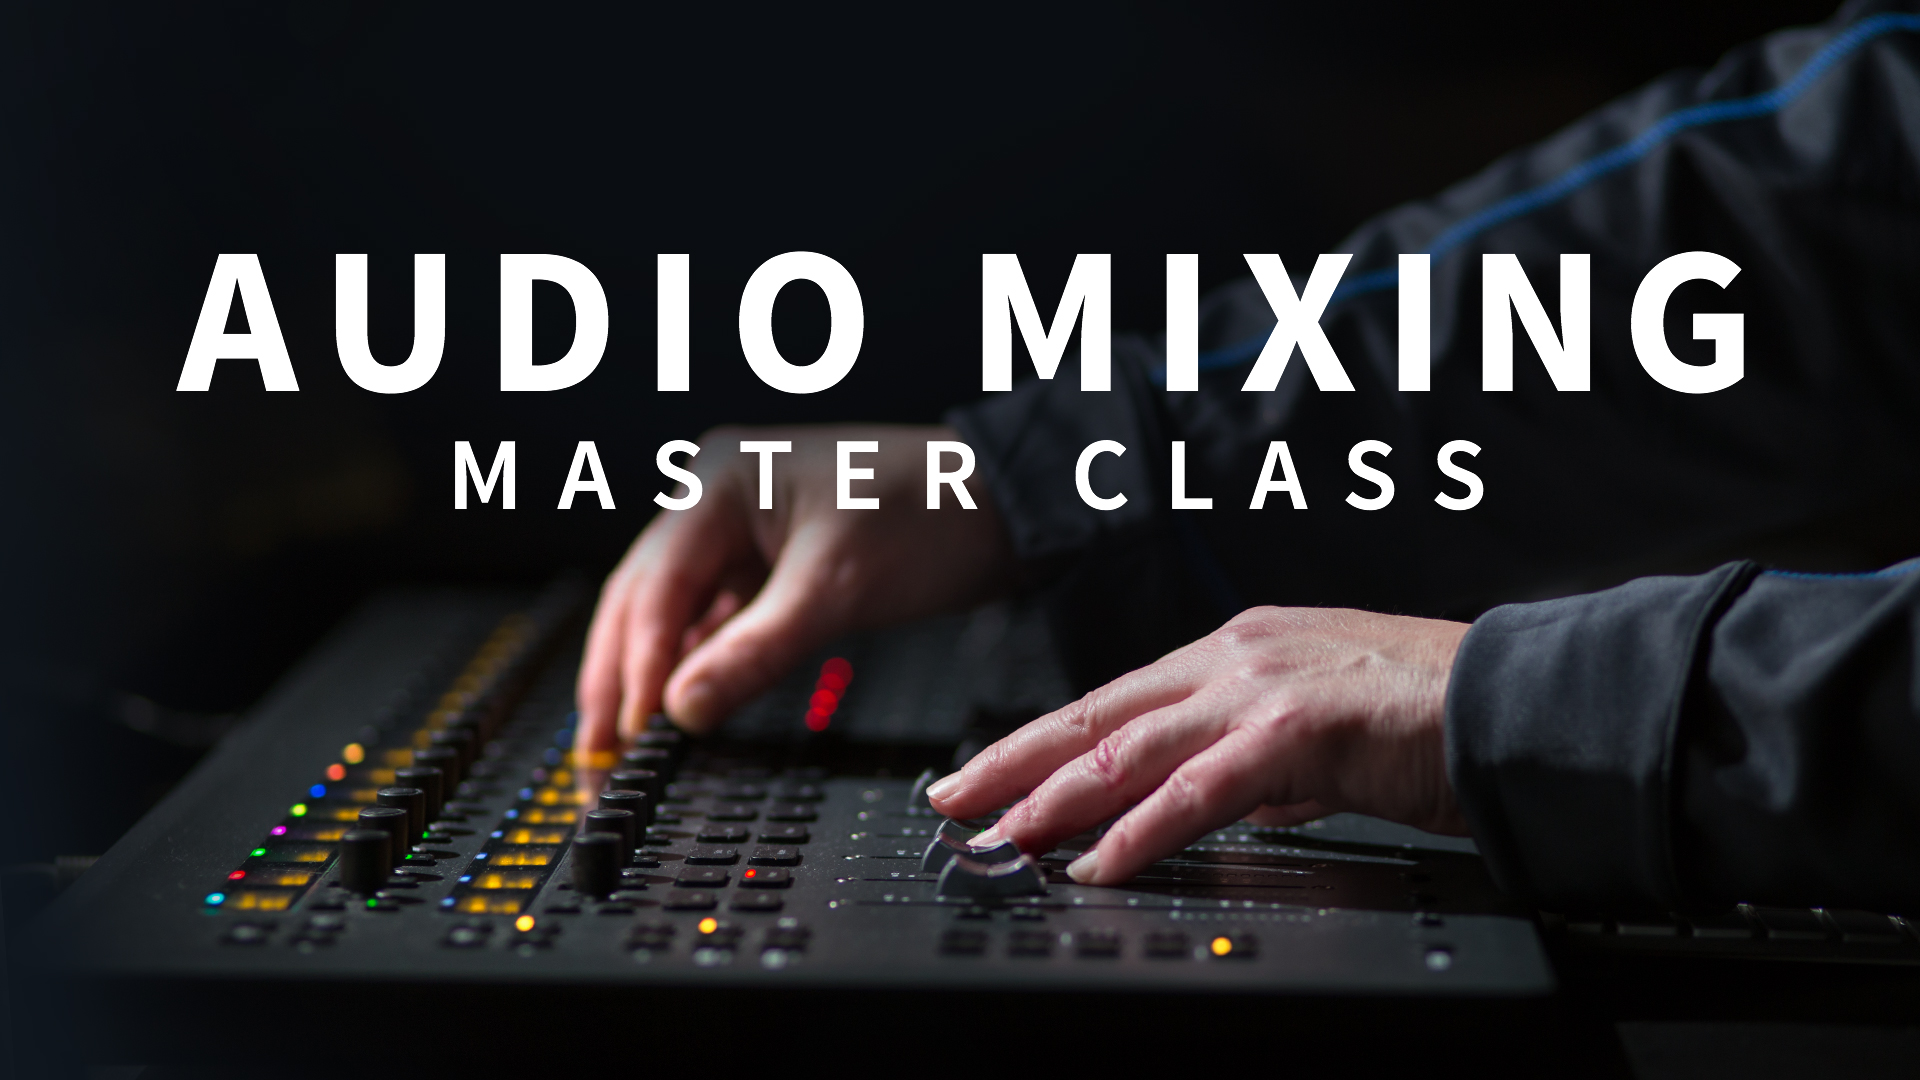 Audio Mixing Master Class